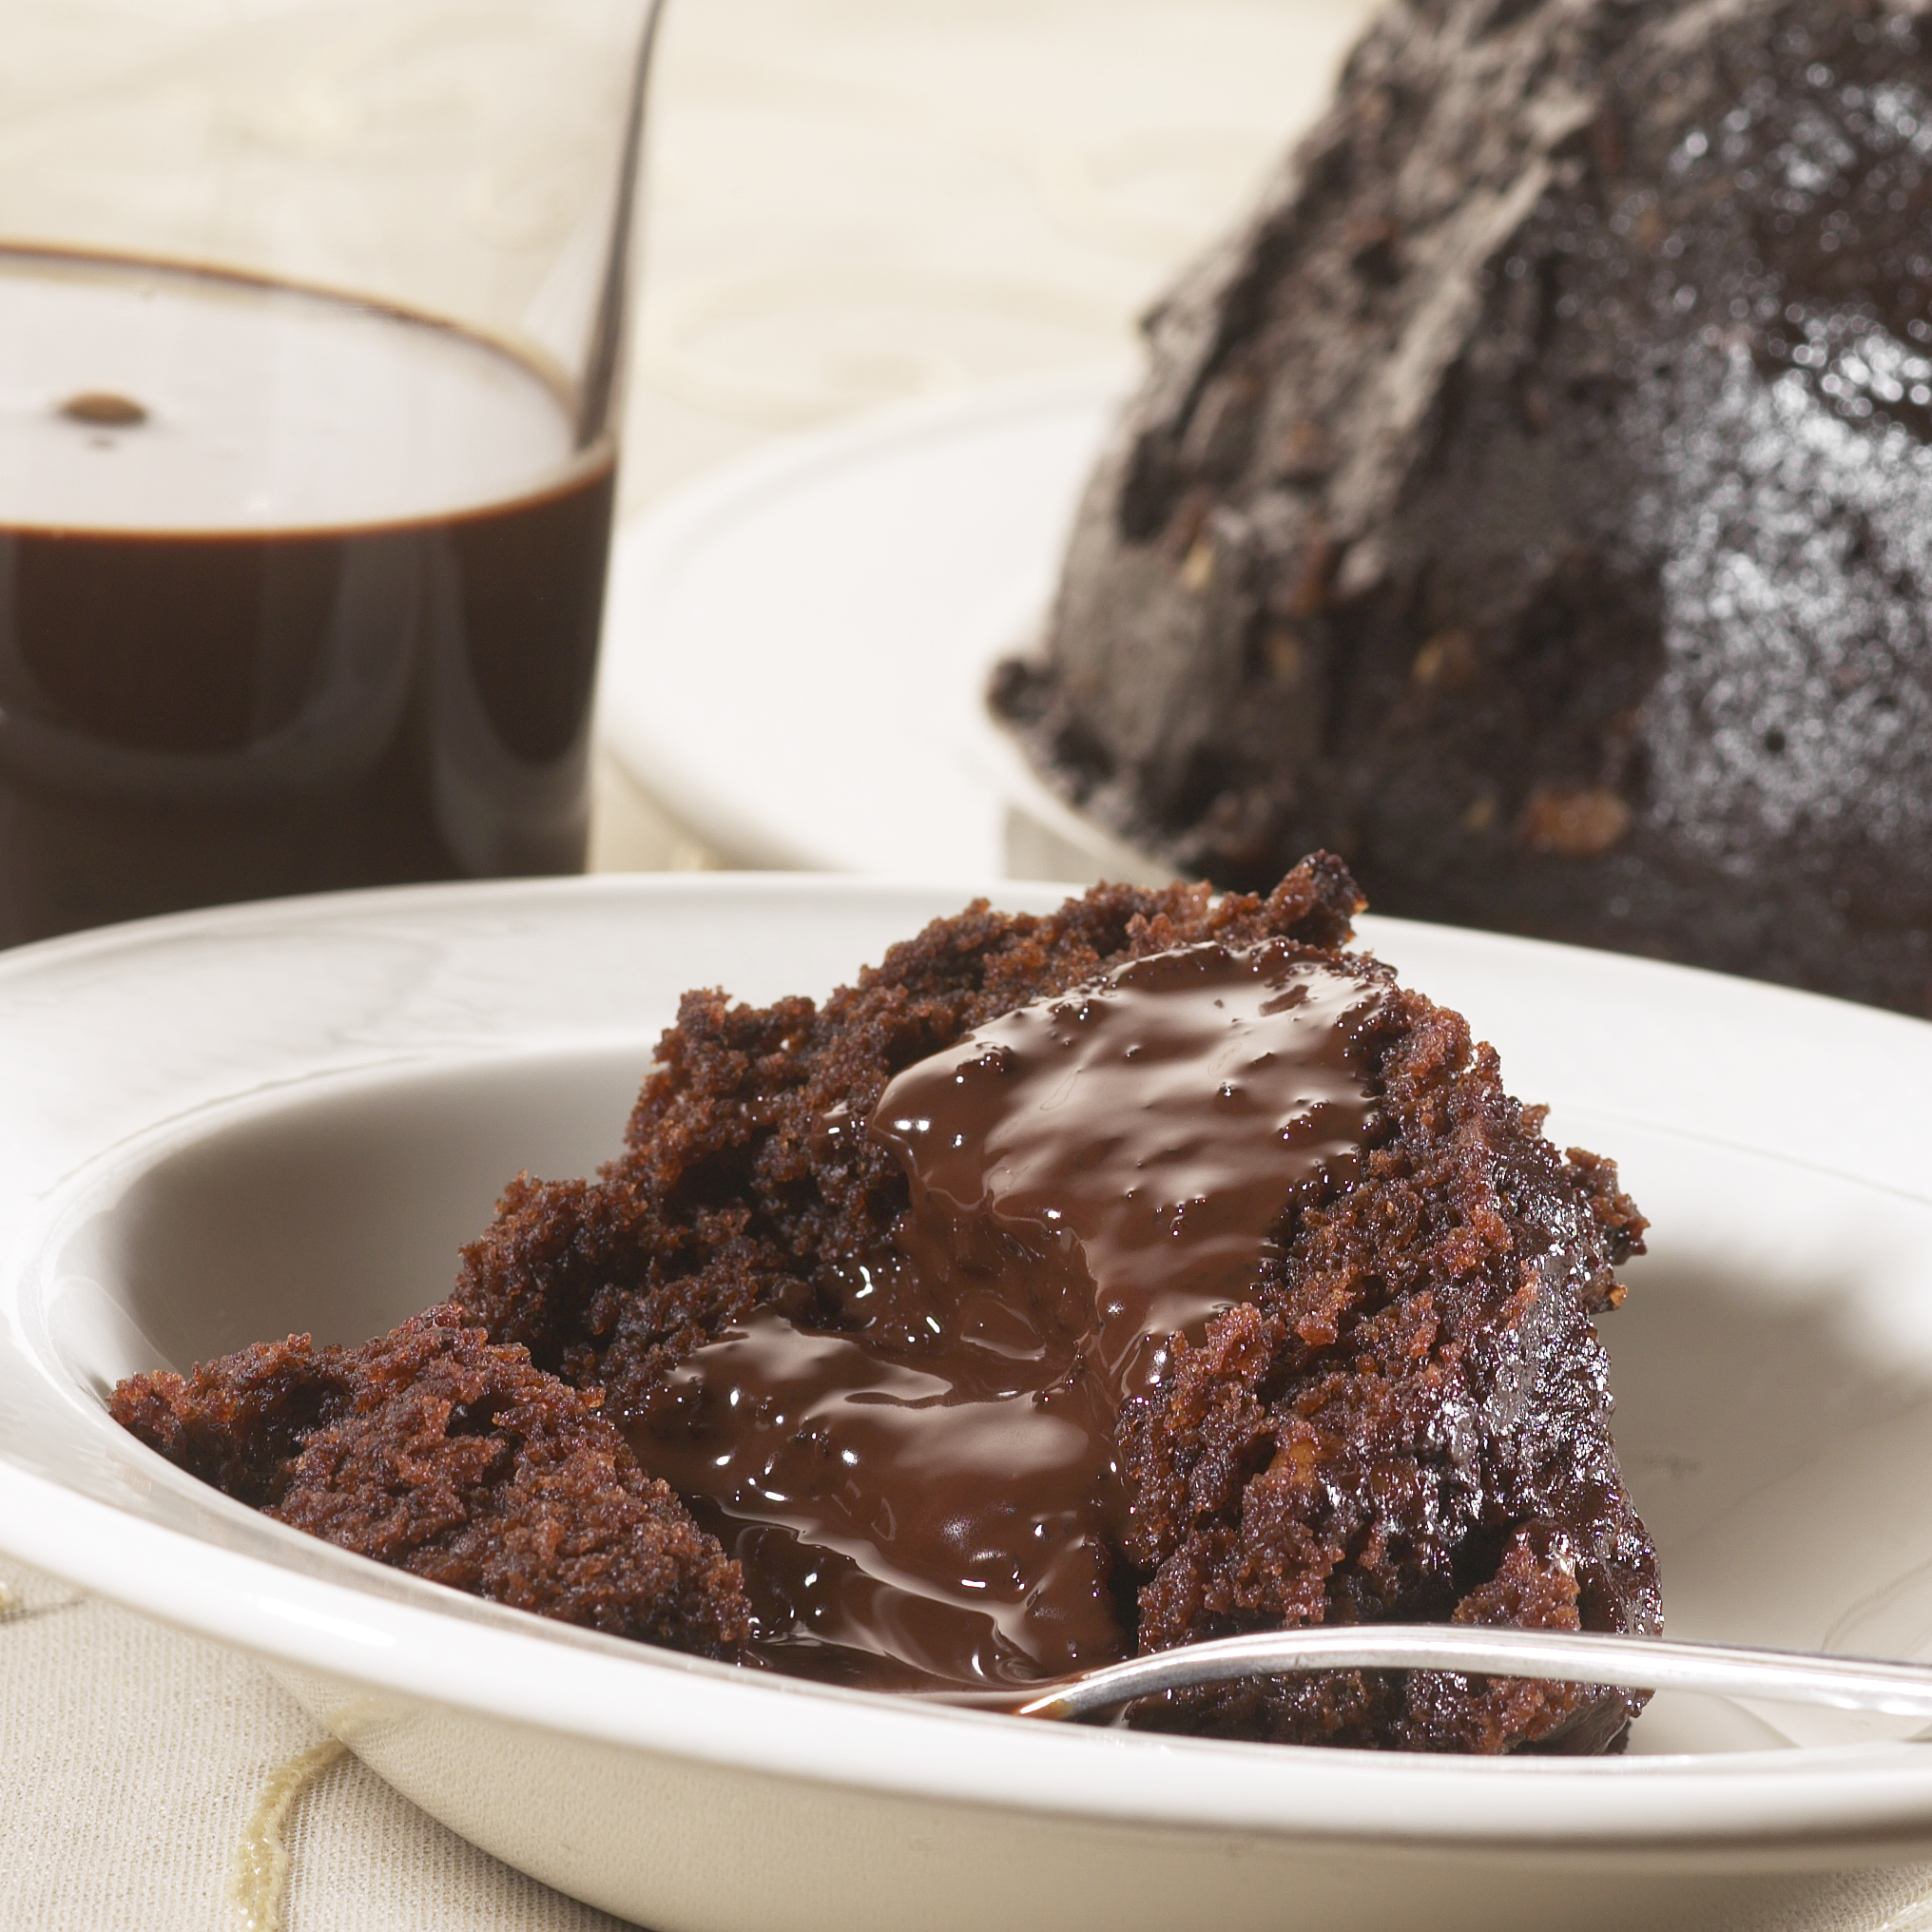 * Chocolate Pudding